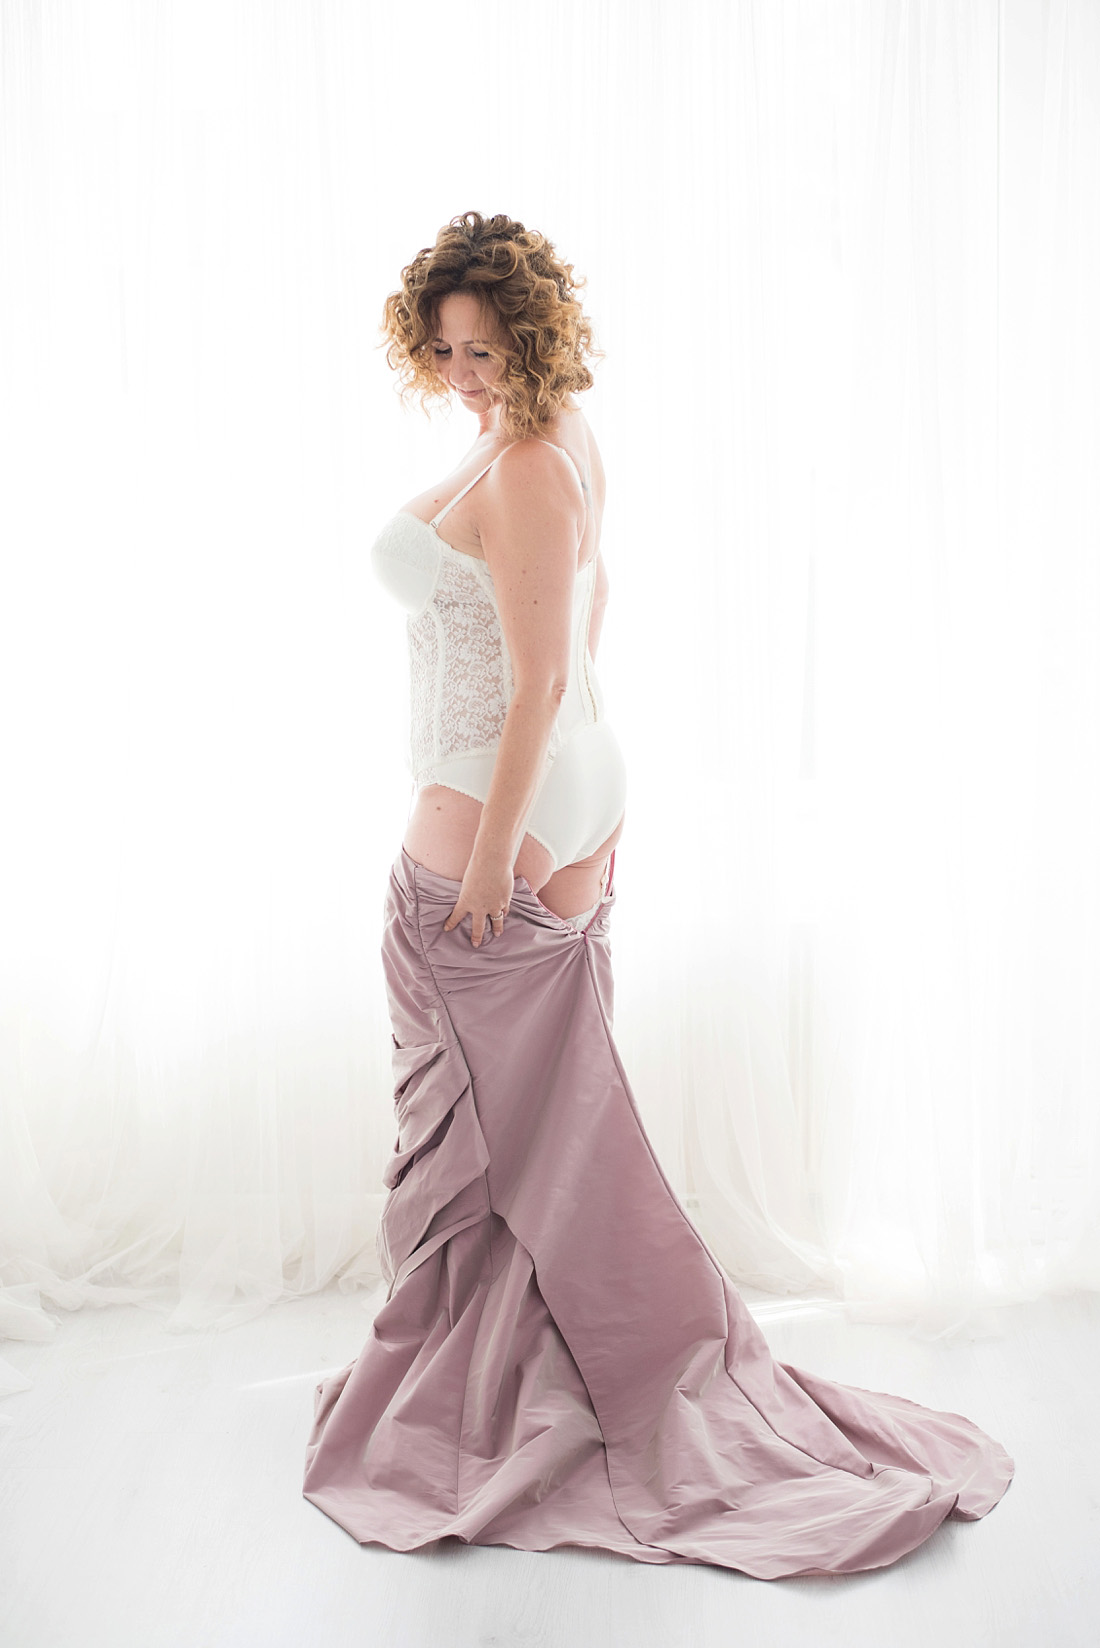 bridal-boudoir-bruidslingerie-bruidsjurk-breda